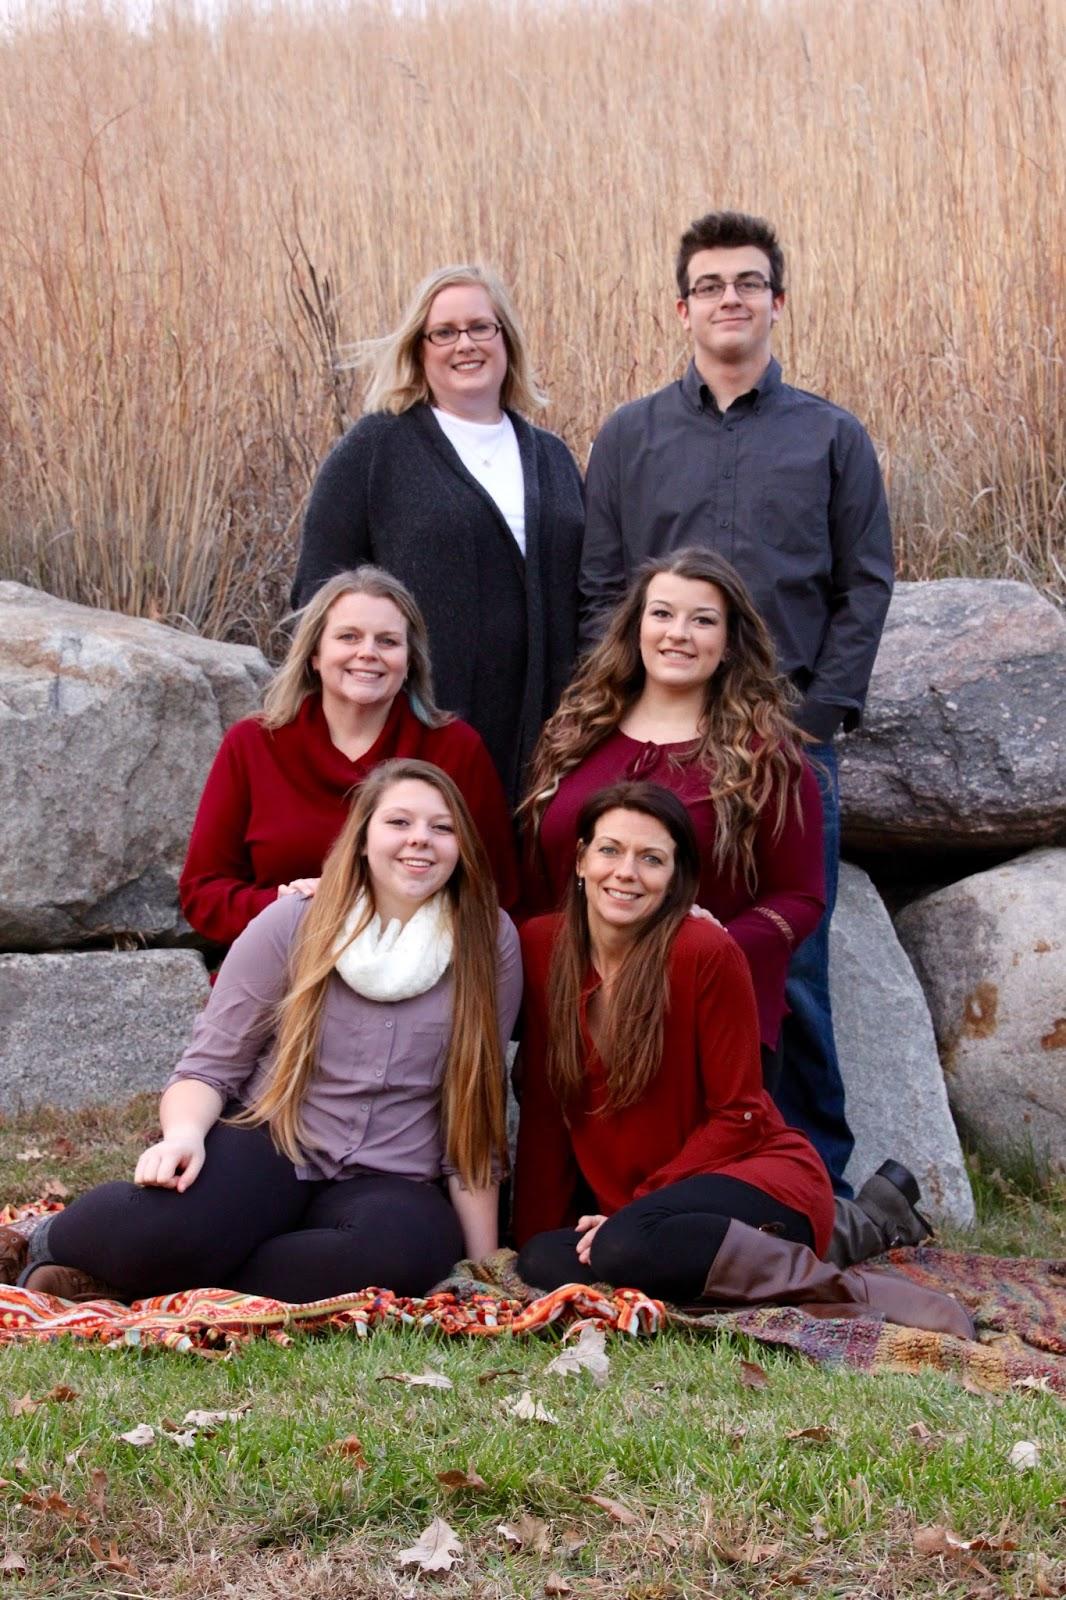 Melissa Plamann Photography: The Skodis Schimtz Family: Family Shoot ...